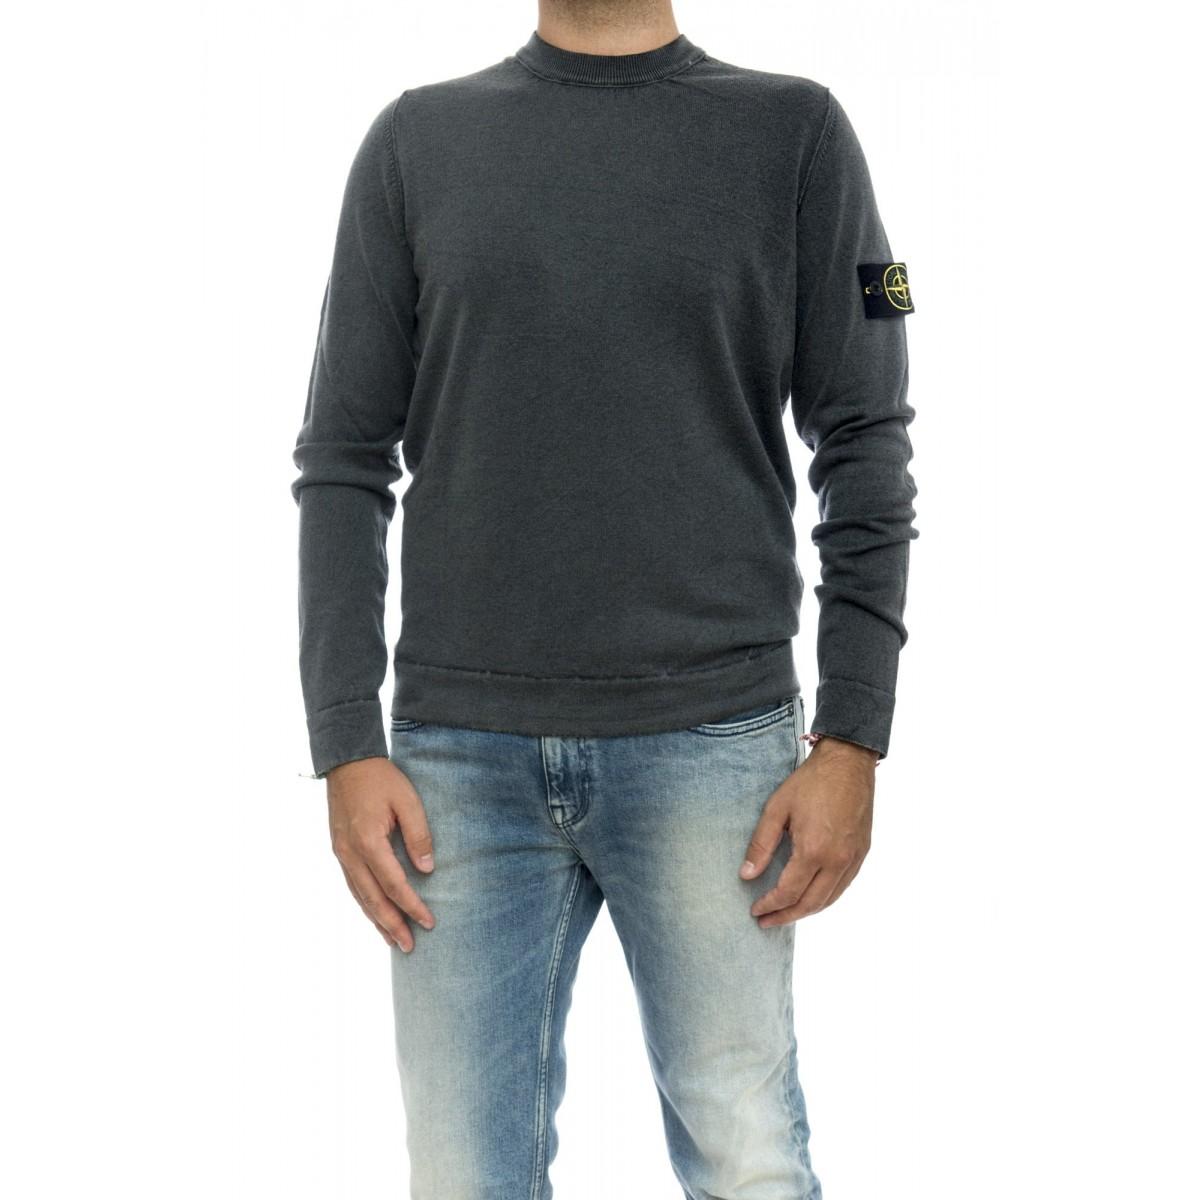 Maglia uomo - 561d4 merinos effetto frosted 100% lana